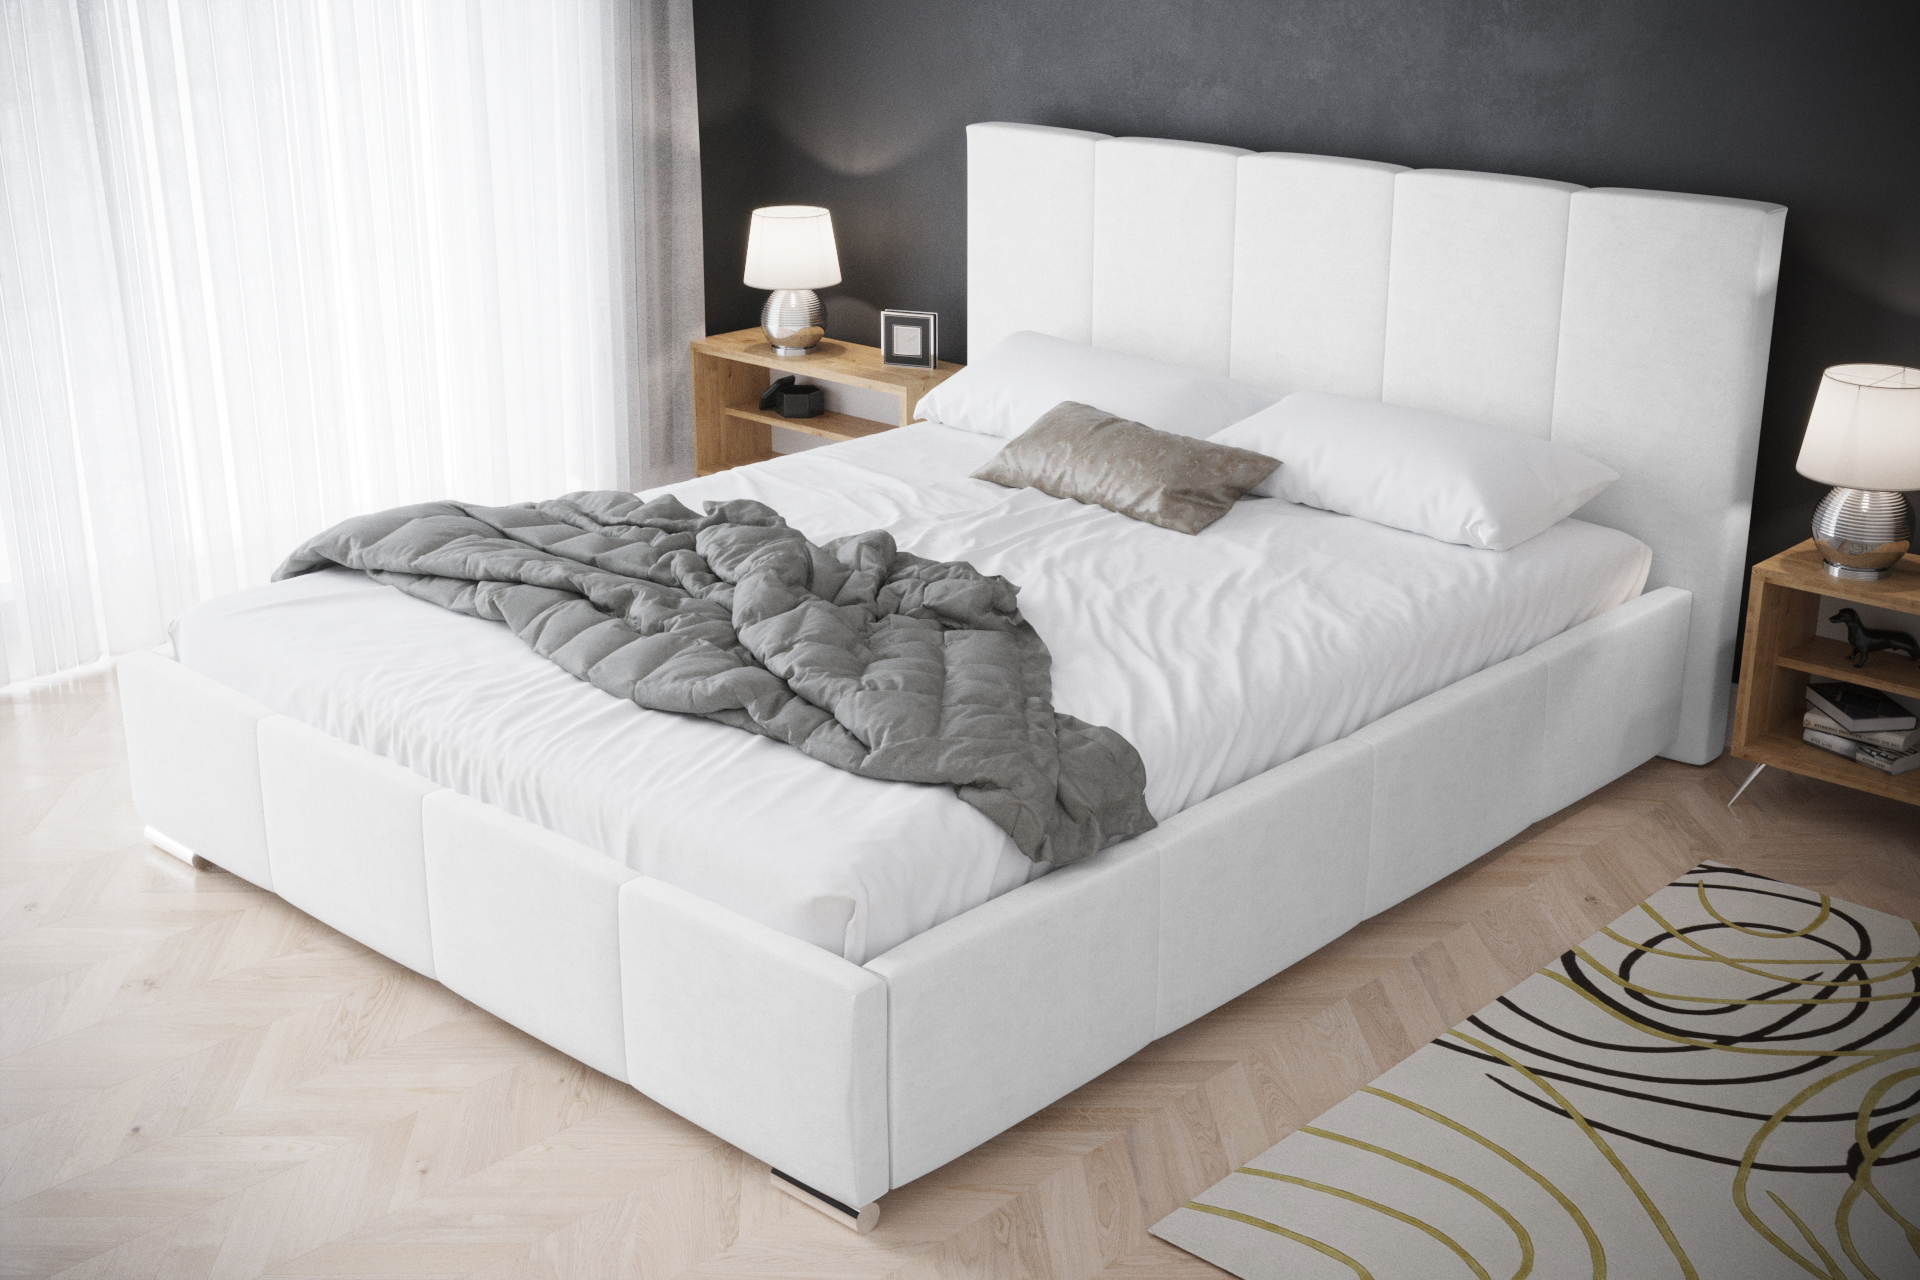 Full Size of Modernes Bett Designer Bettsofa Schlafsofa Mario 180x200 Bettgestell 140x200 200x200 Schlafbett Doppelbett Polsterbett Lattenrost 160x200 90x200 Mit Und Bett Modernes Bett